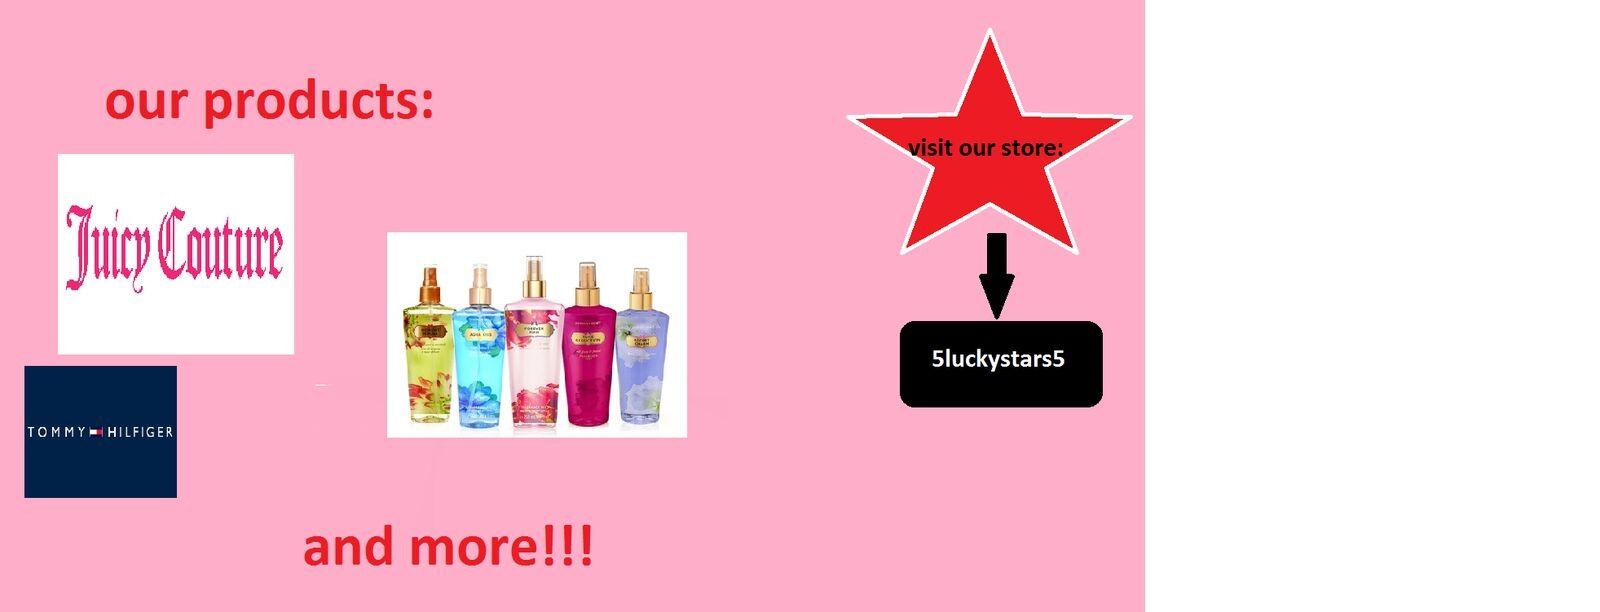 5LUCKY STARS5